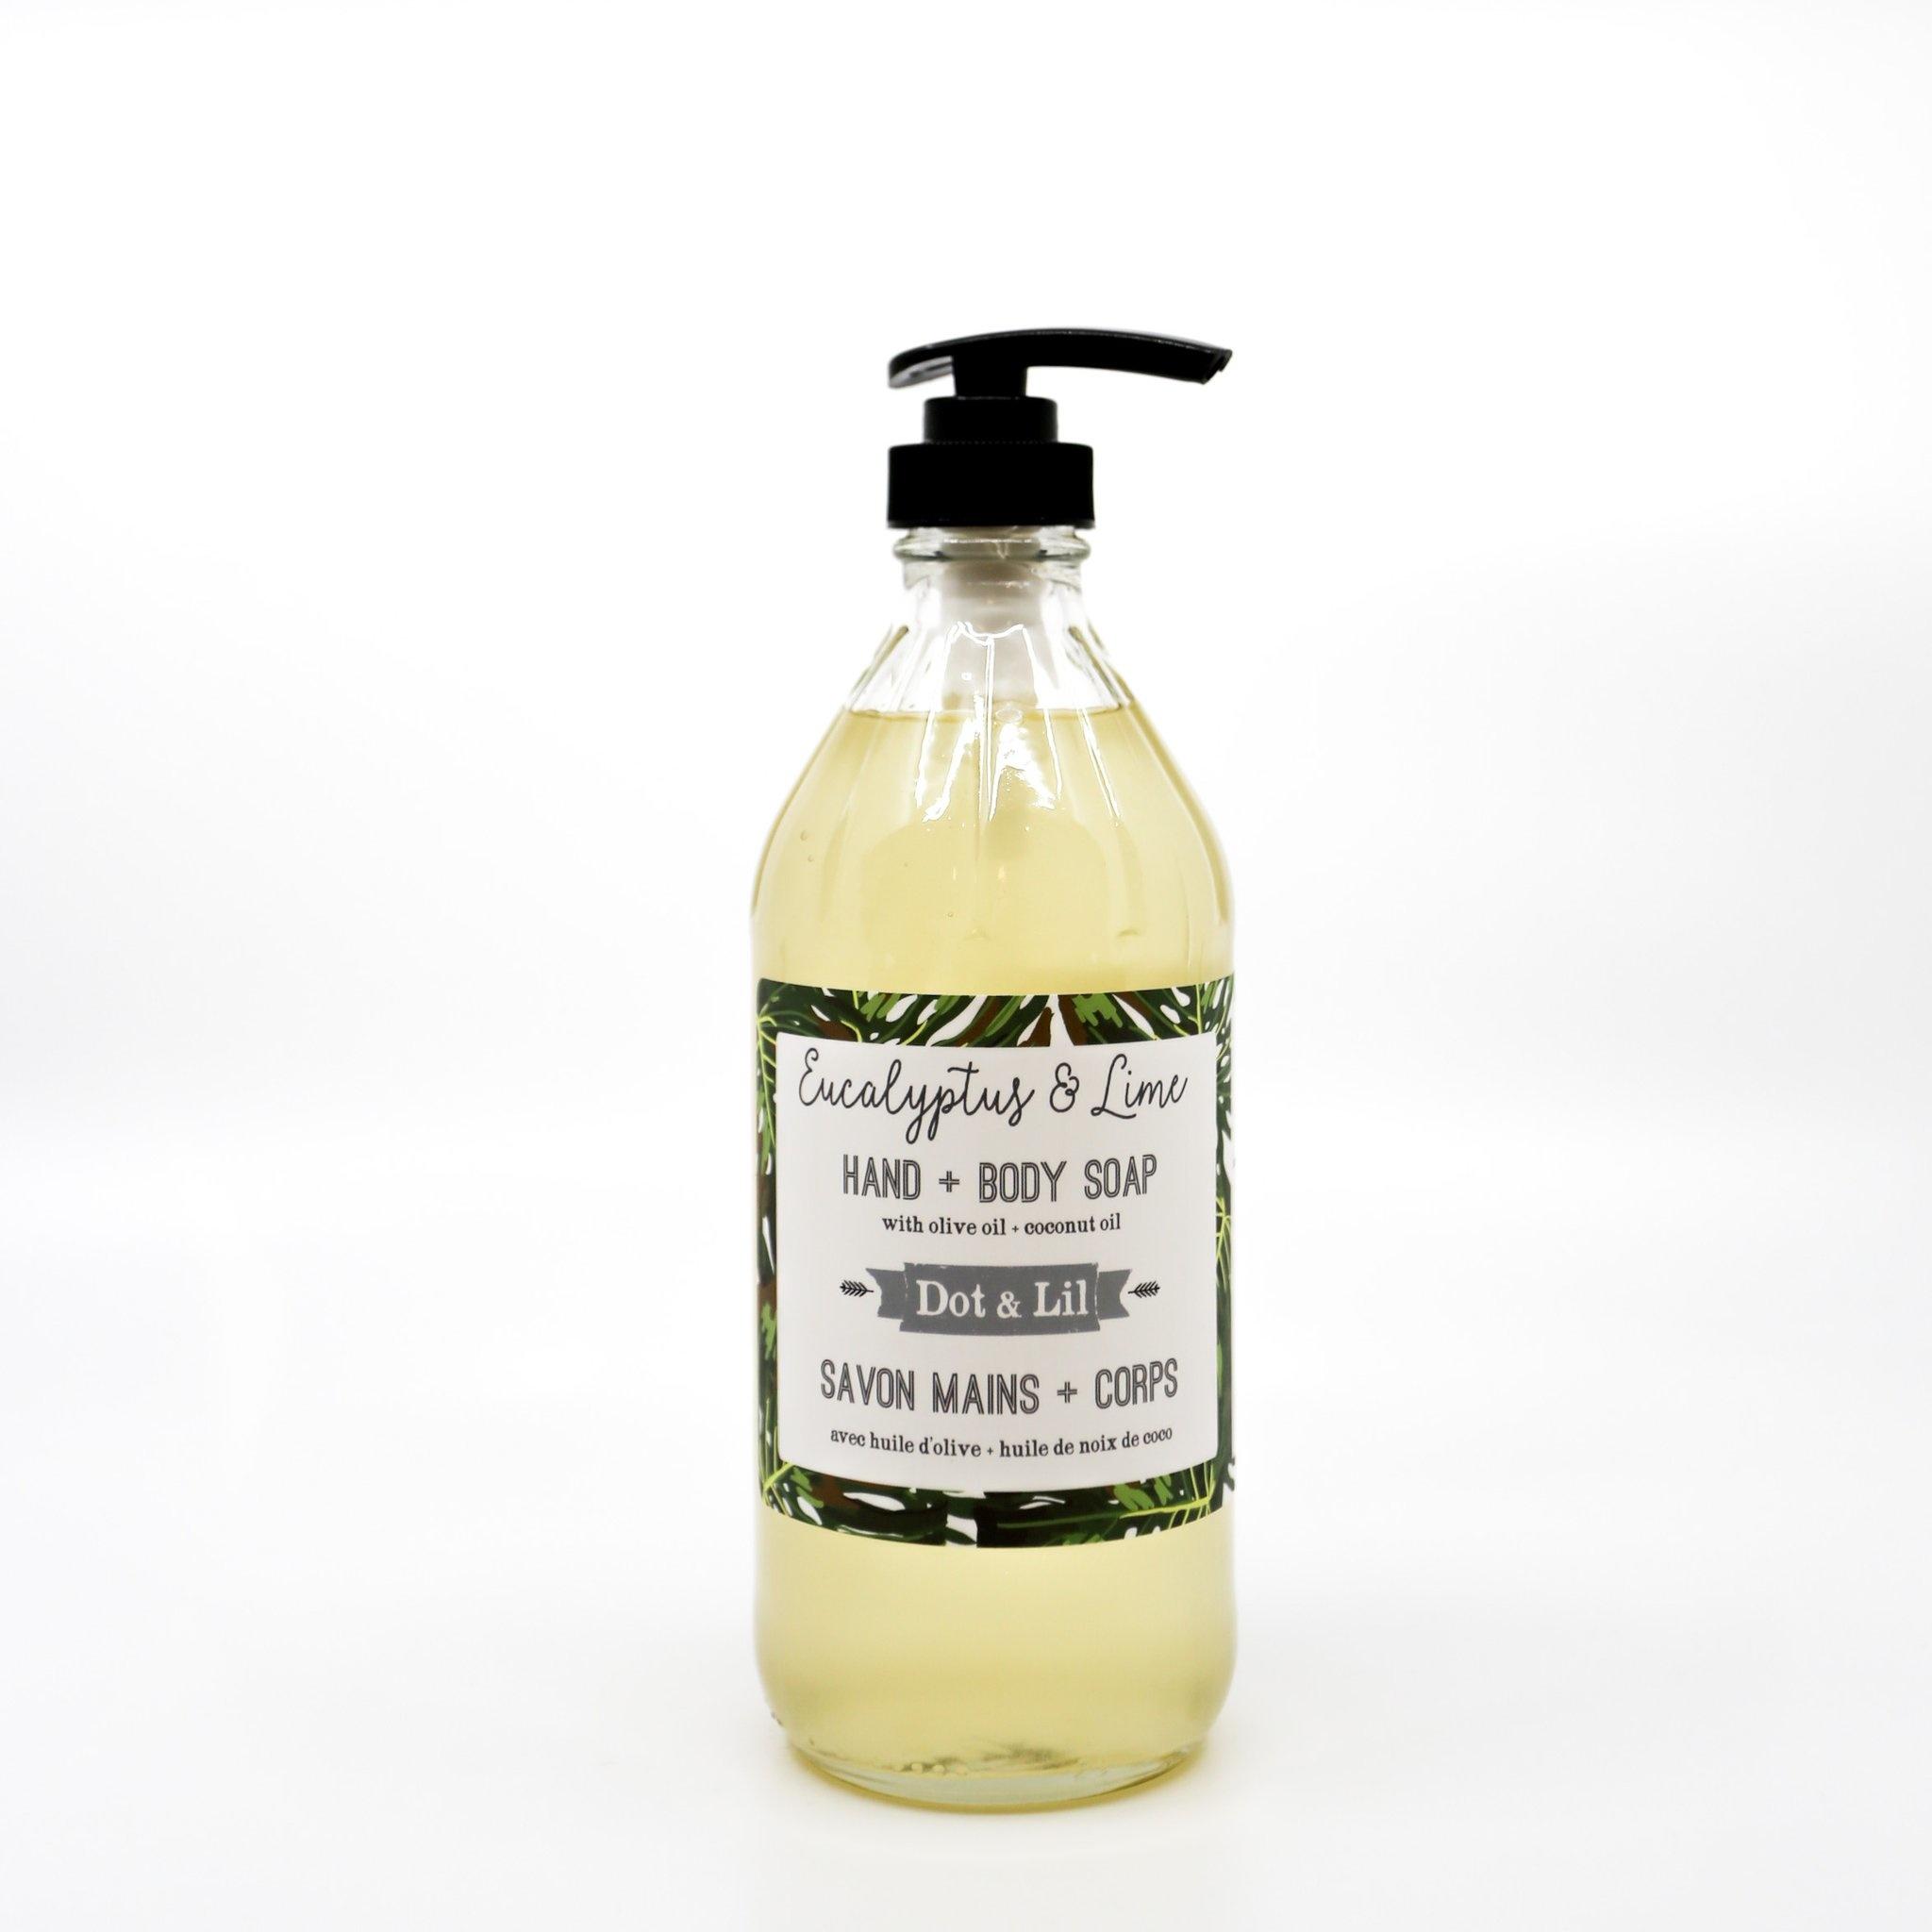 Dot and Lil Savon liquide eucalyptus & lime